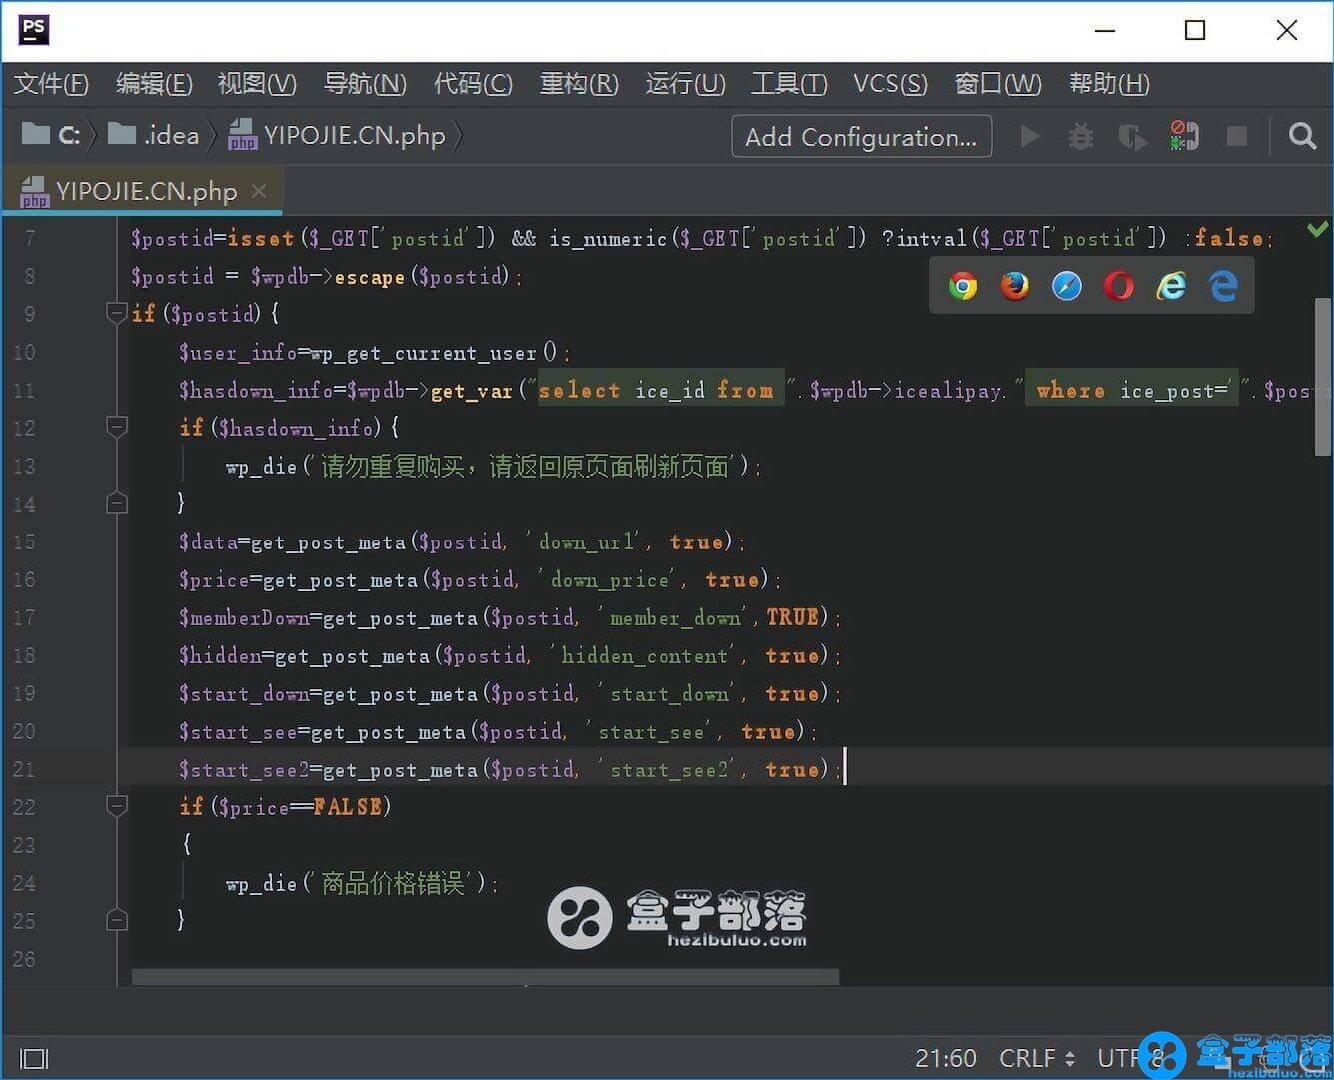 JetBrains PhpStorm v2018.2.5 - PHP 代码编辑开发工具汉化版